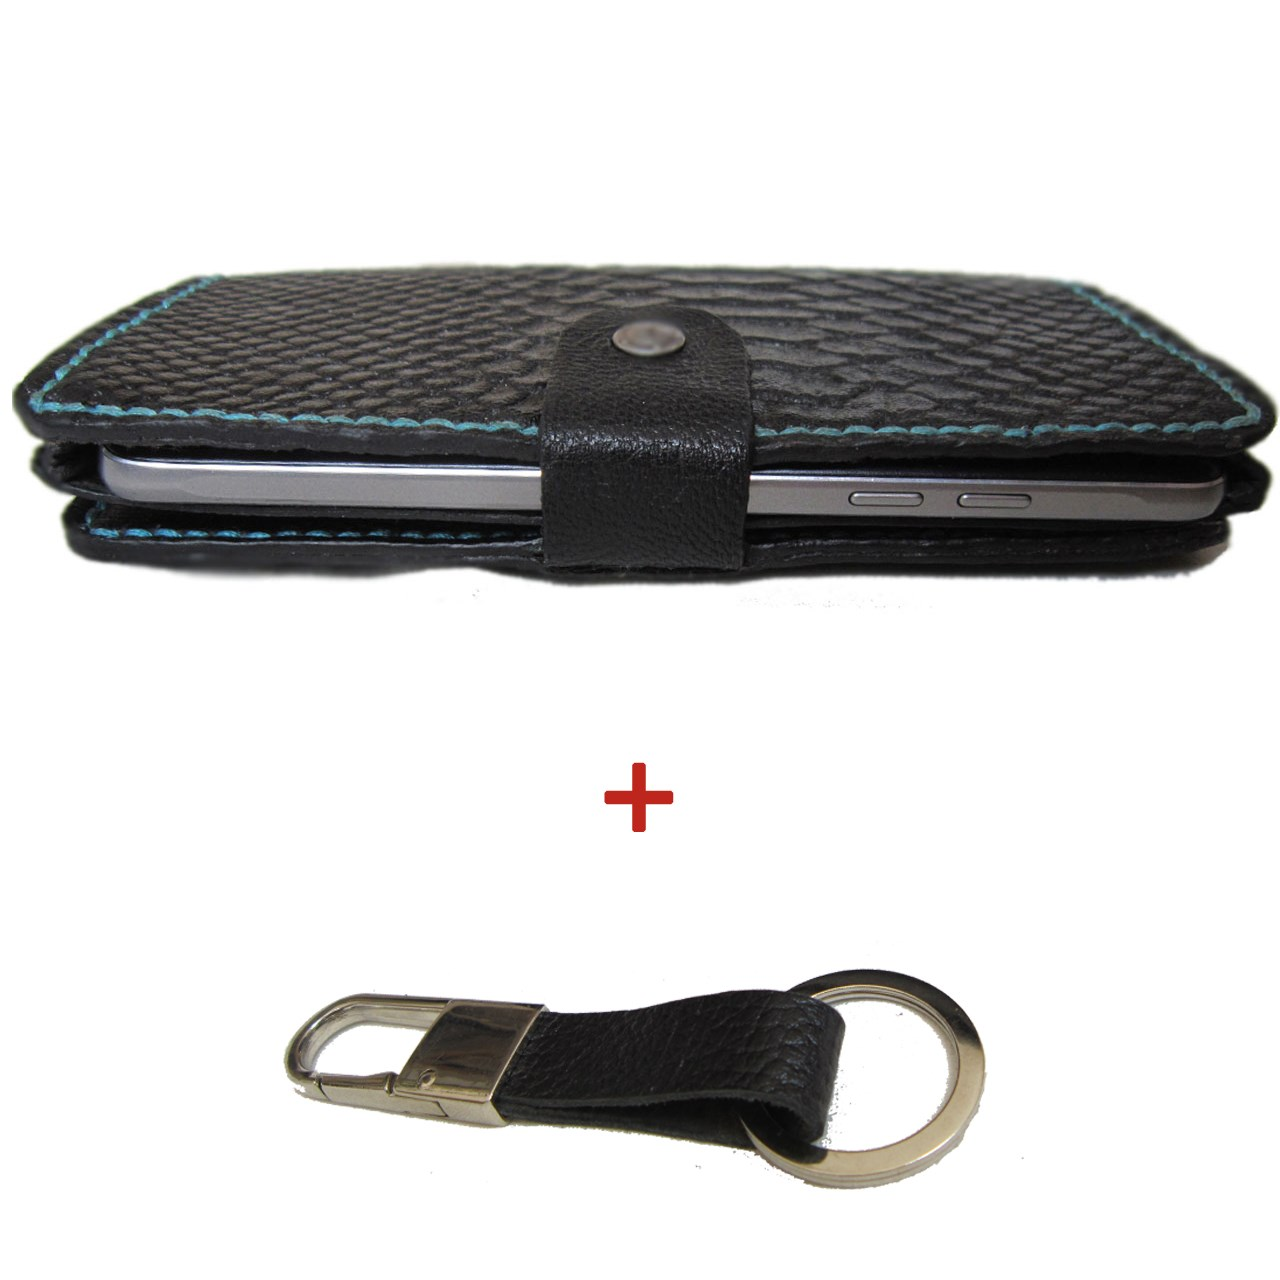 کیف پول و موبایل  چرم طبیعی دستدوز  مژی مدل MOB1